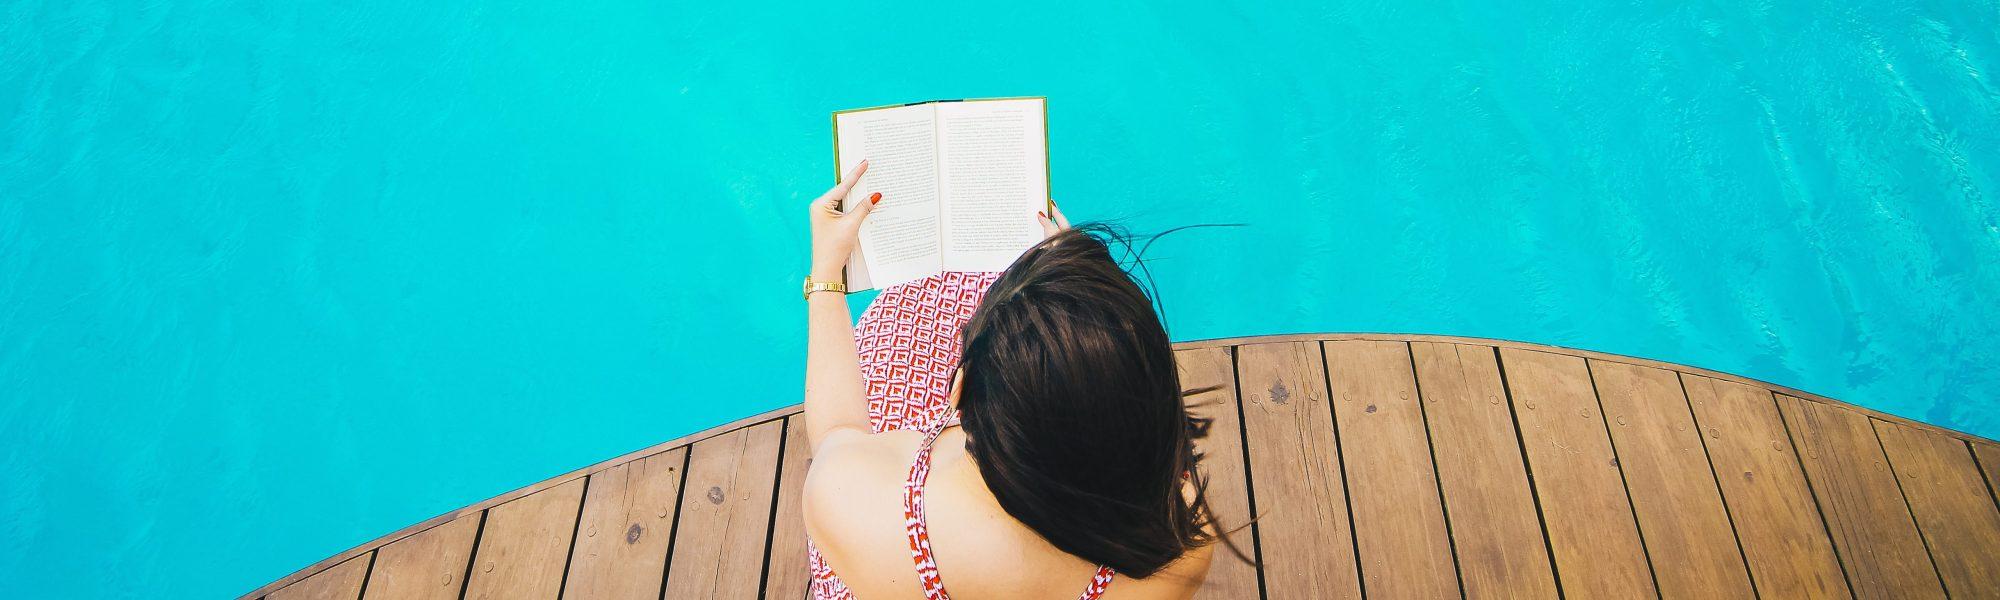 10 Easy Ways to Start Single Tasking